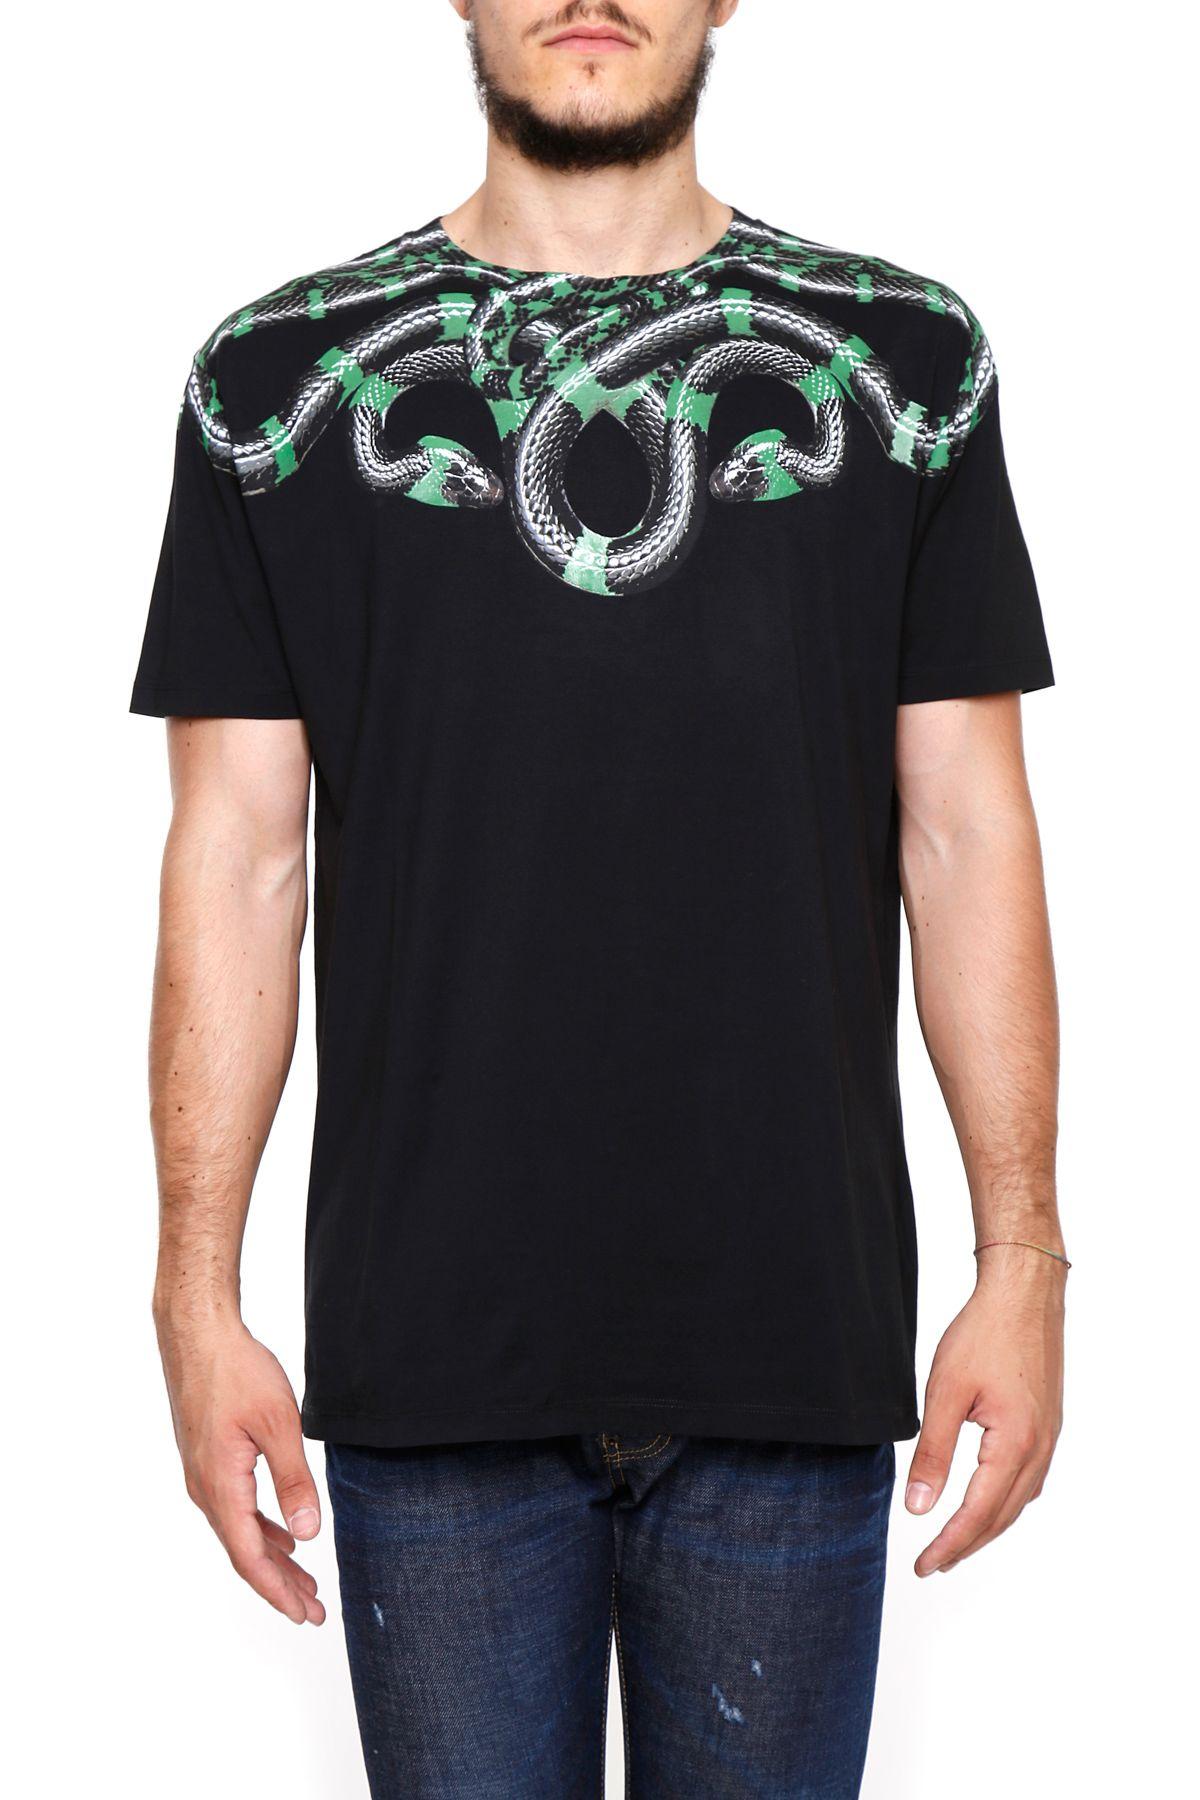 Ragko T-shirt